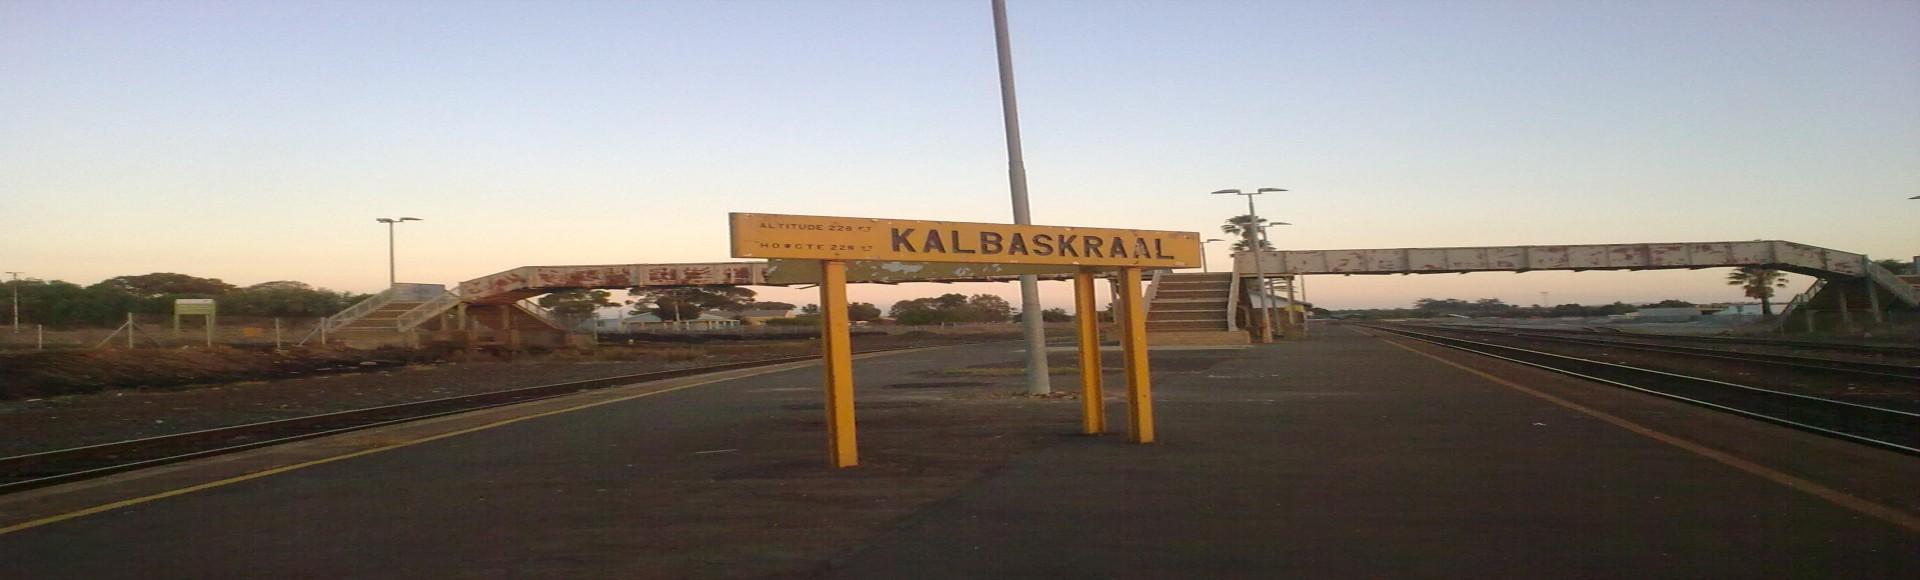 Welcome to the Kalbaskraal Website!